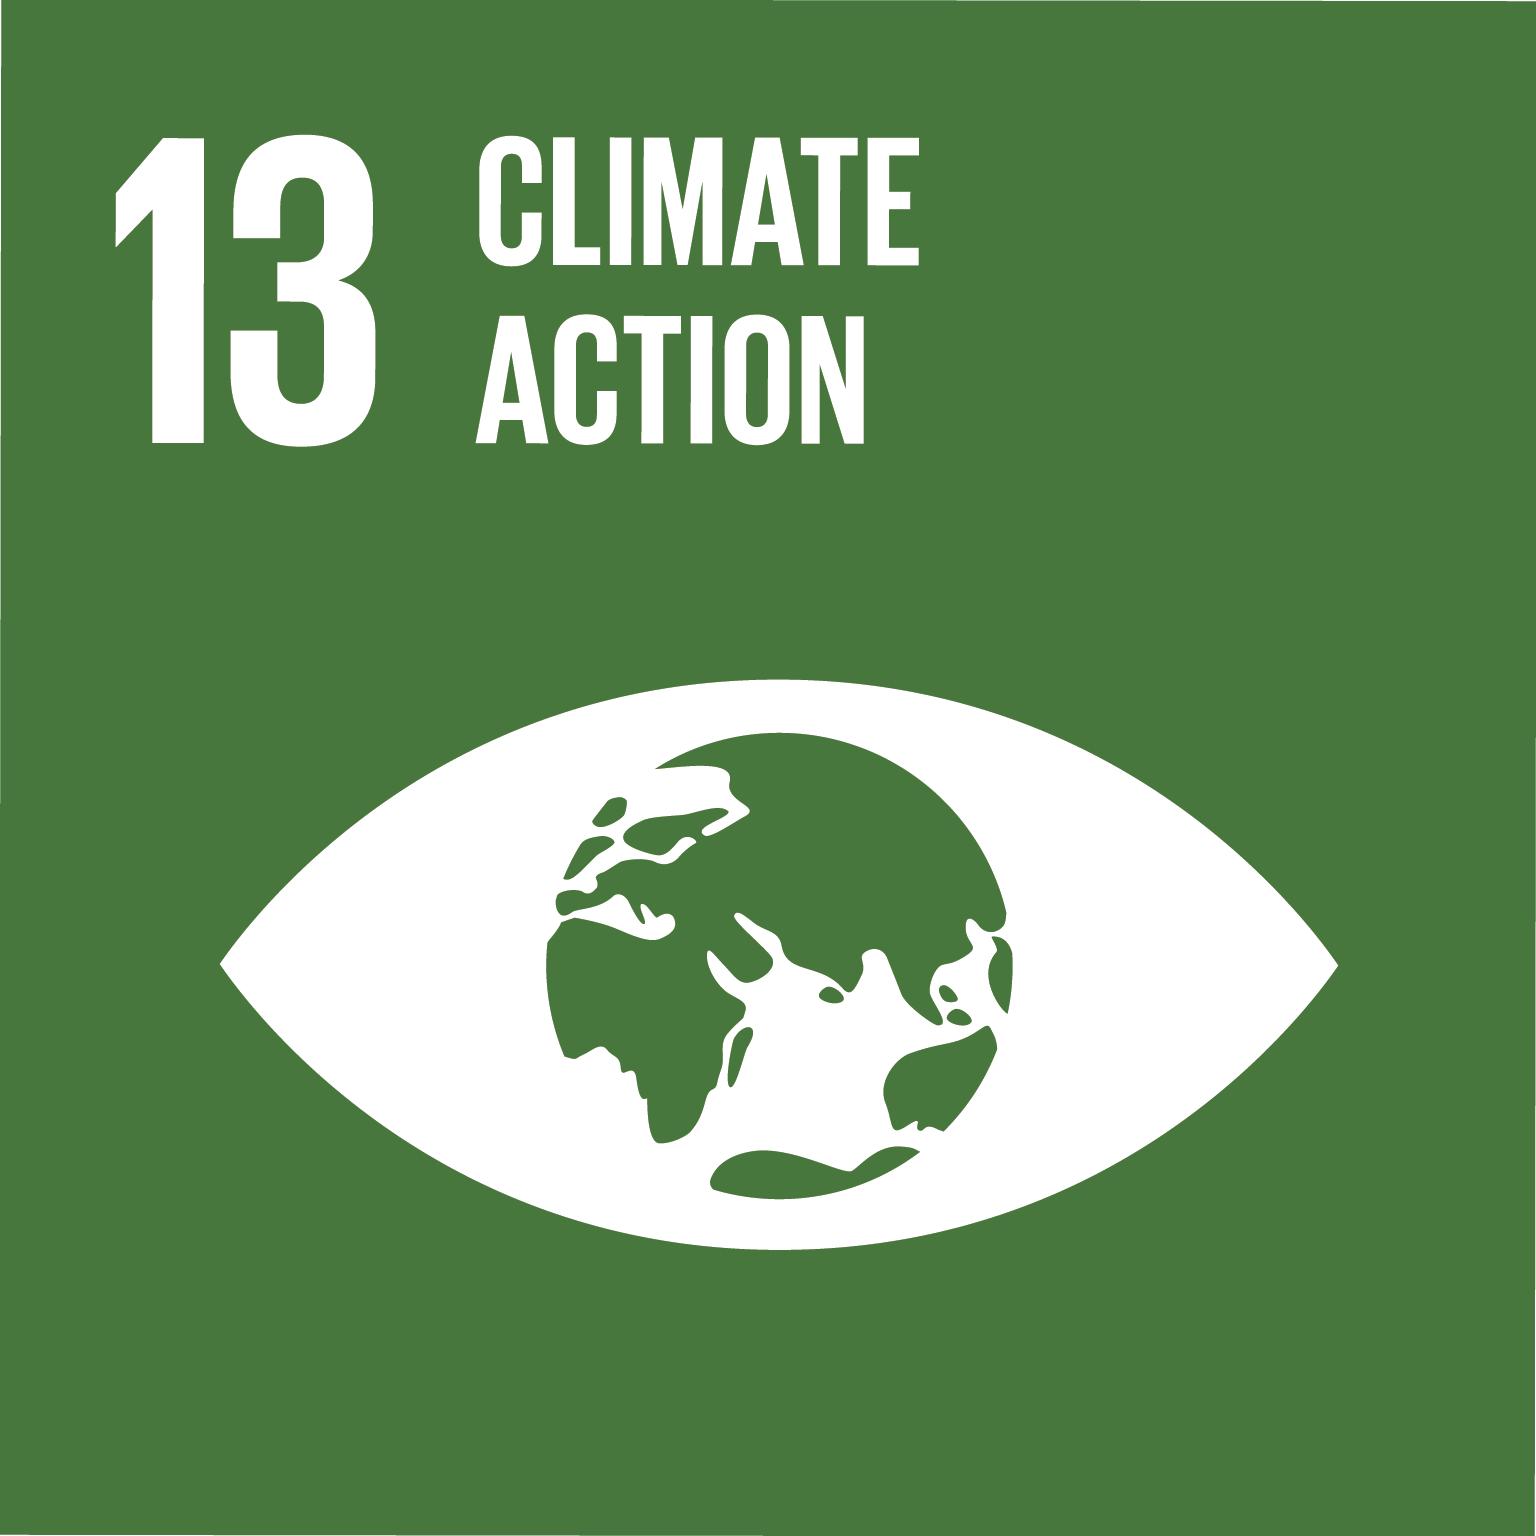 E SDG goals icons individual rgb 13